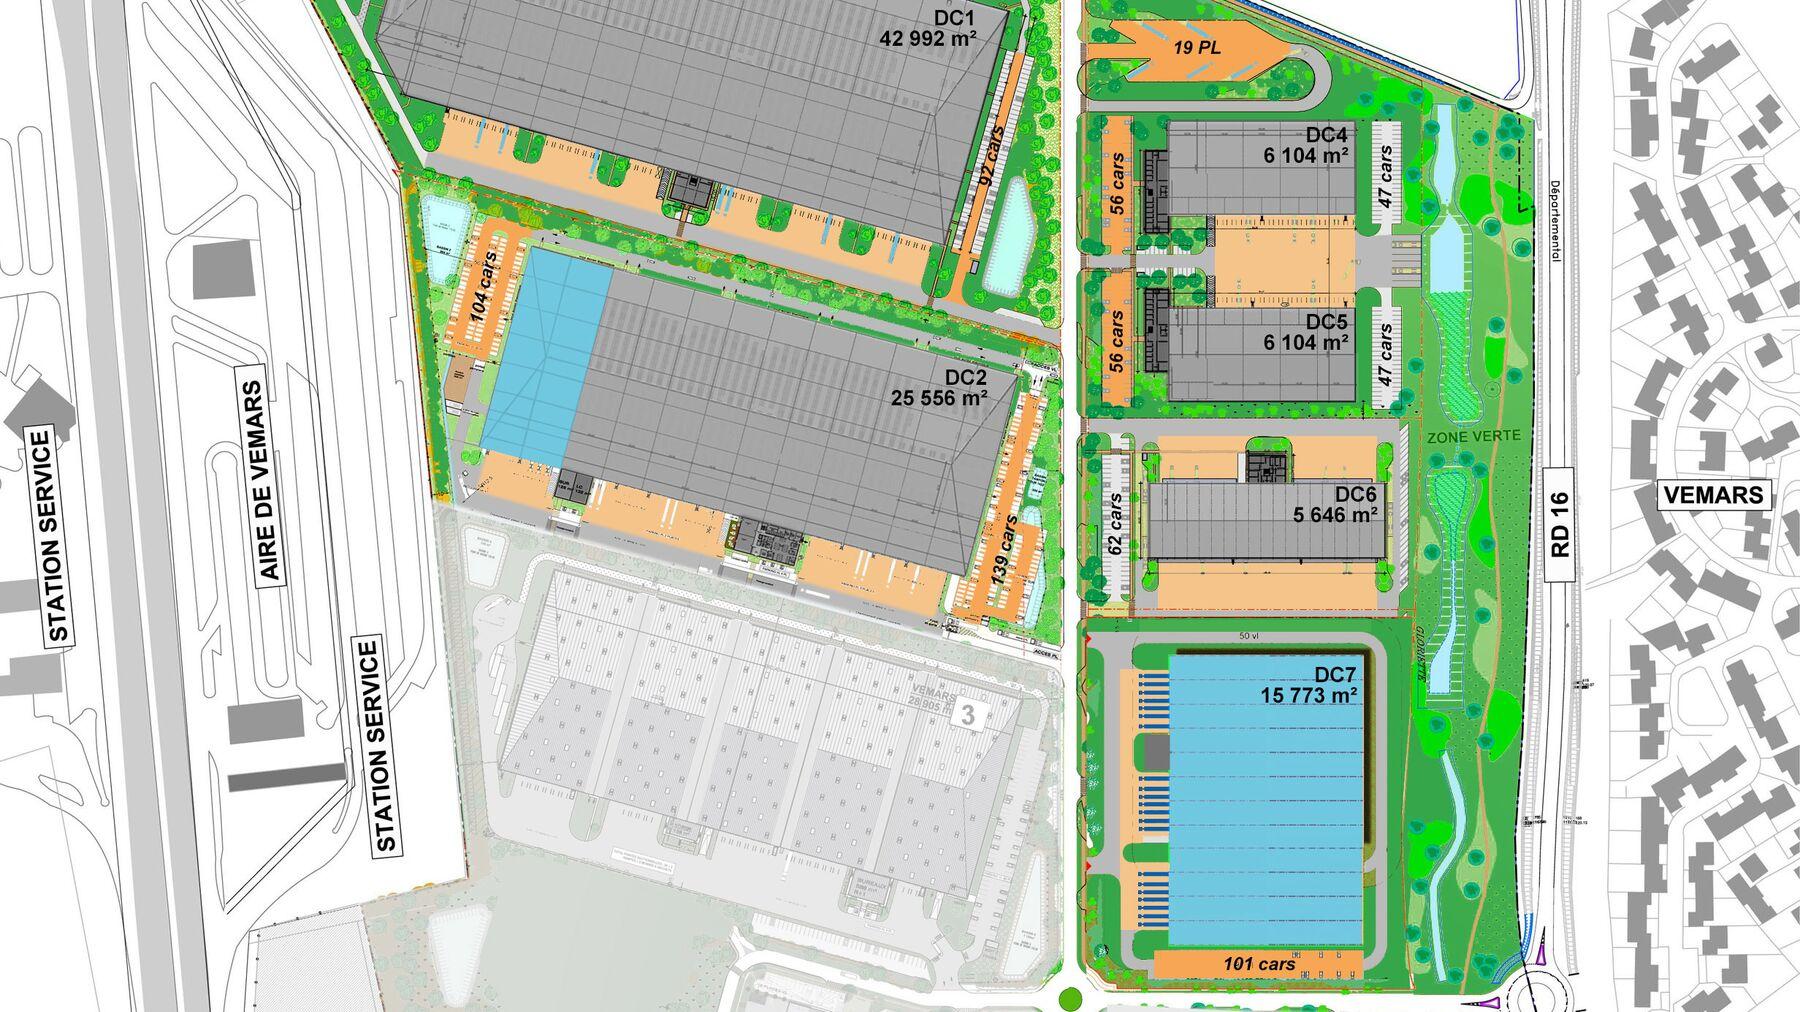 DPM-Prologis-Park-Vemars_Site-layout.jpg